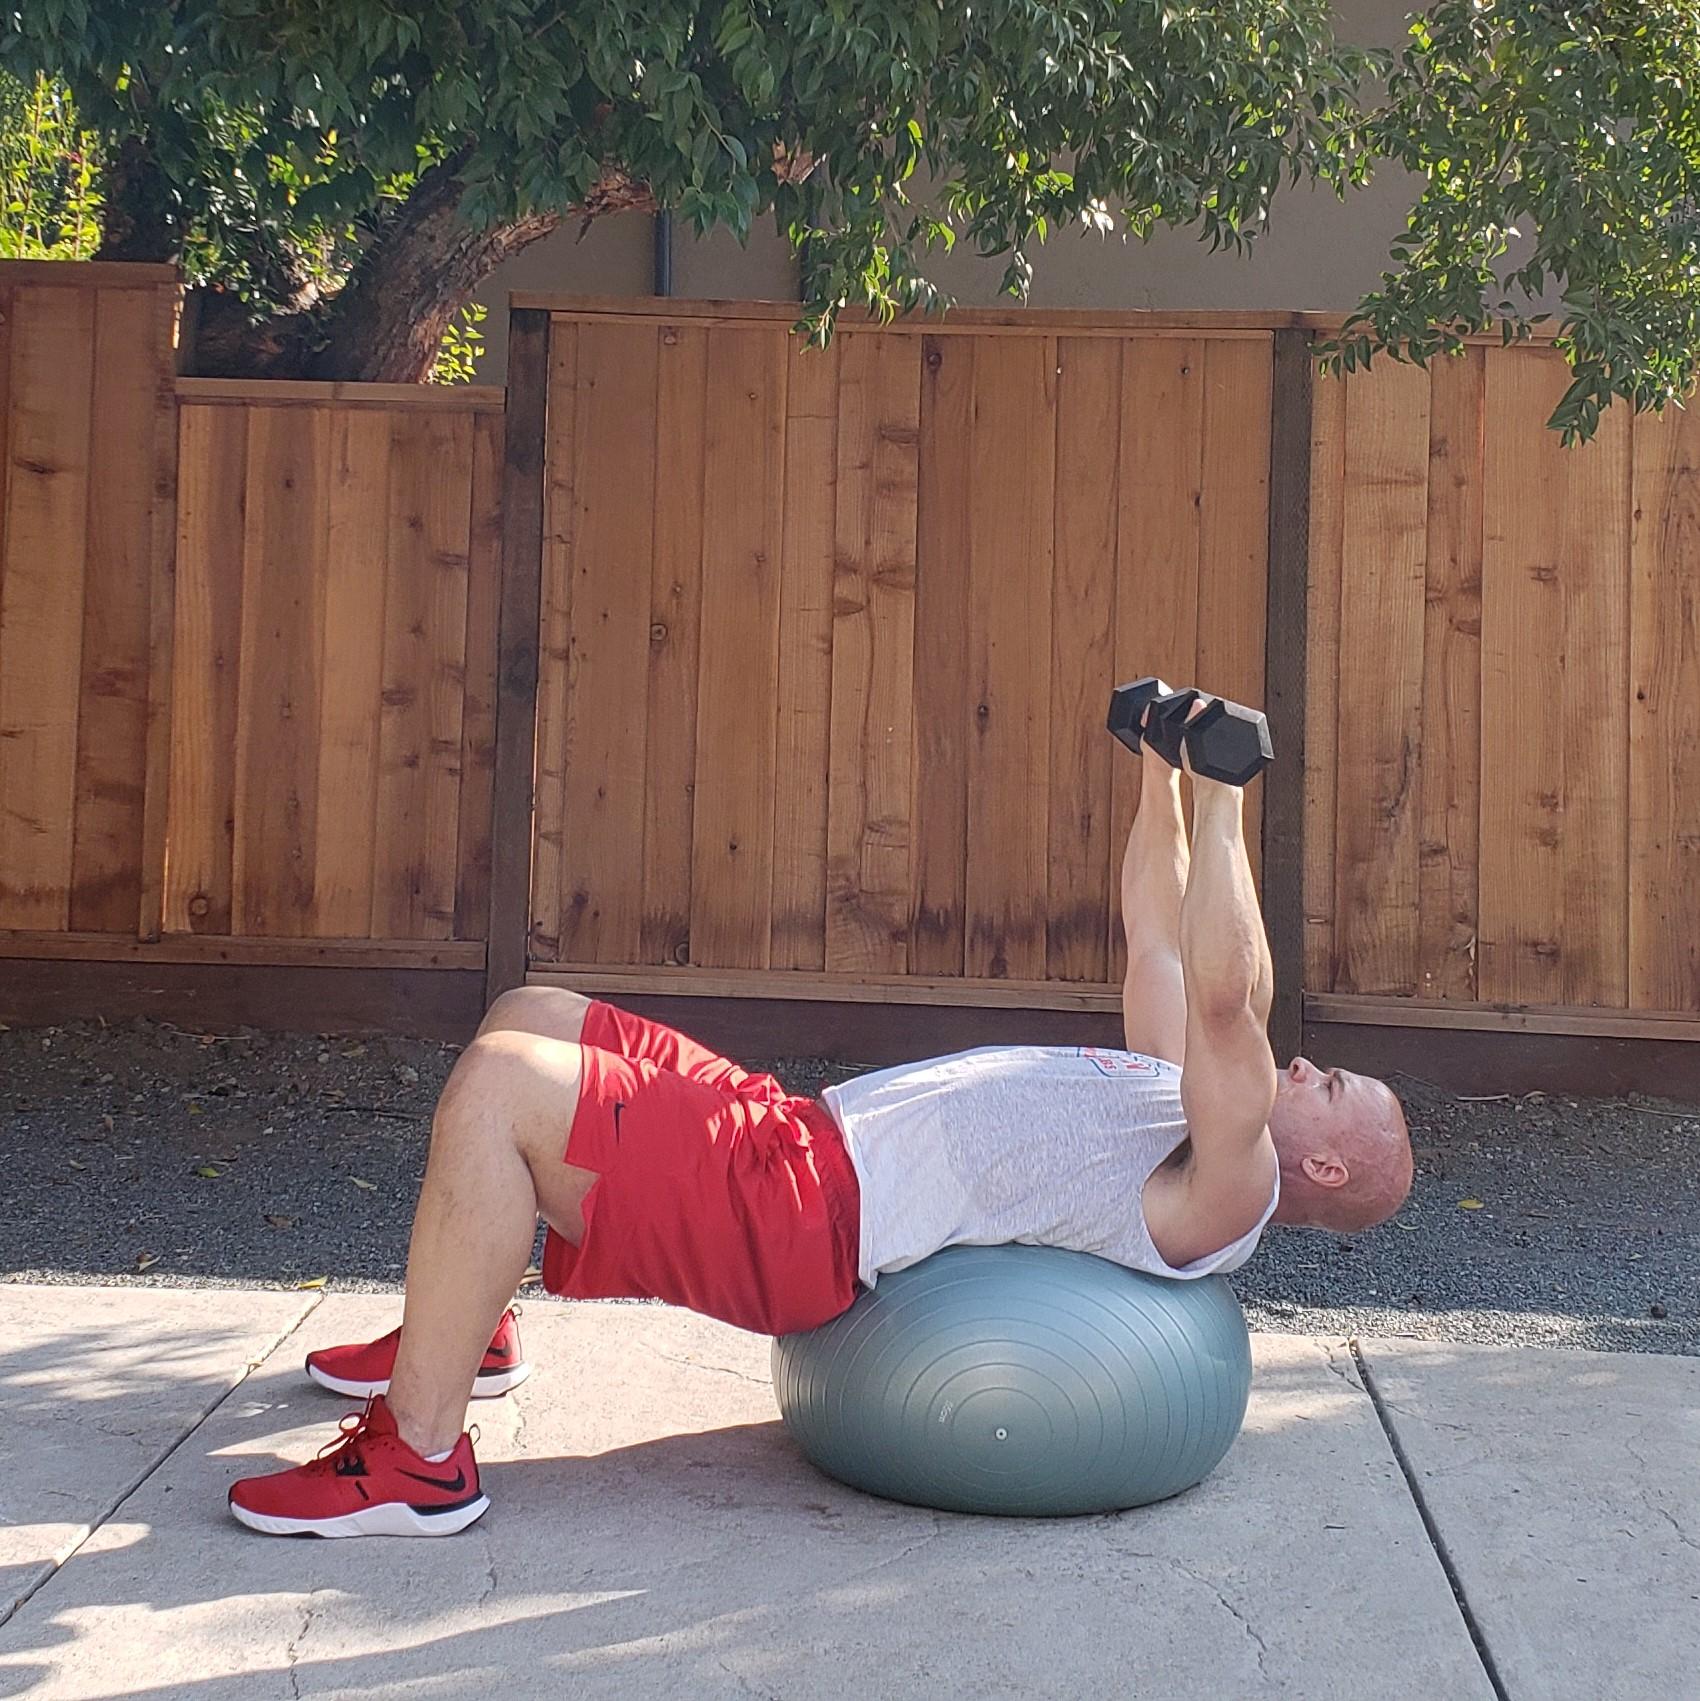 9 dumbbell presses 15 x 15 x 15 Workouts For Older Men HOME Gym Workout #4